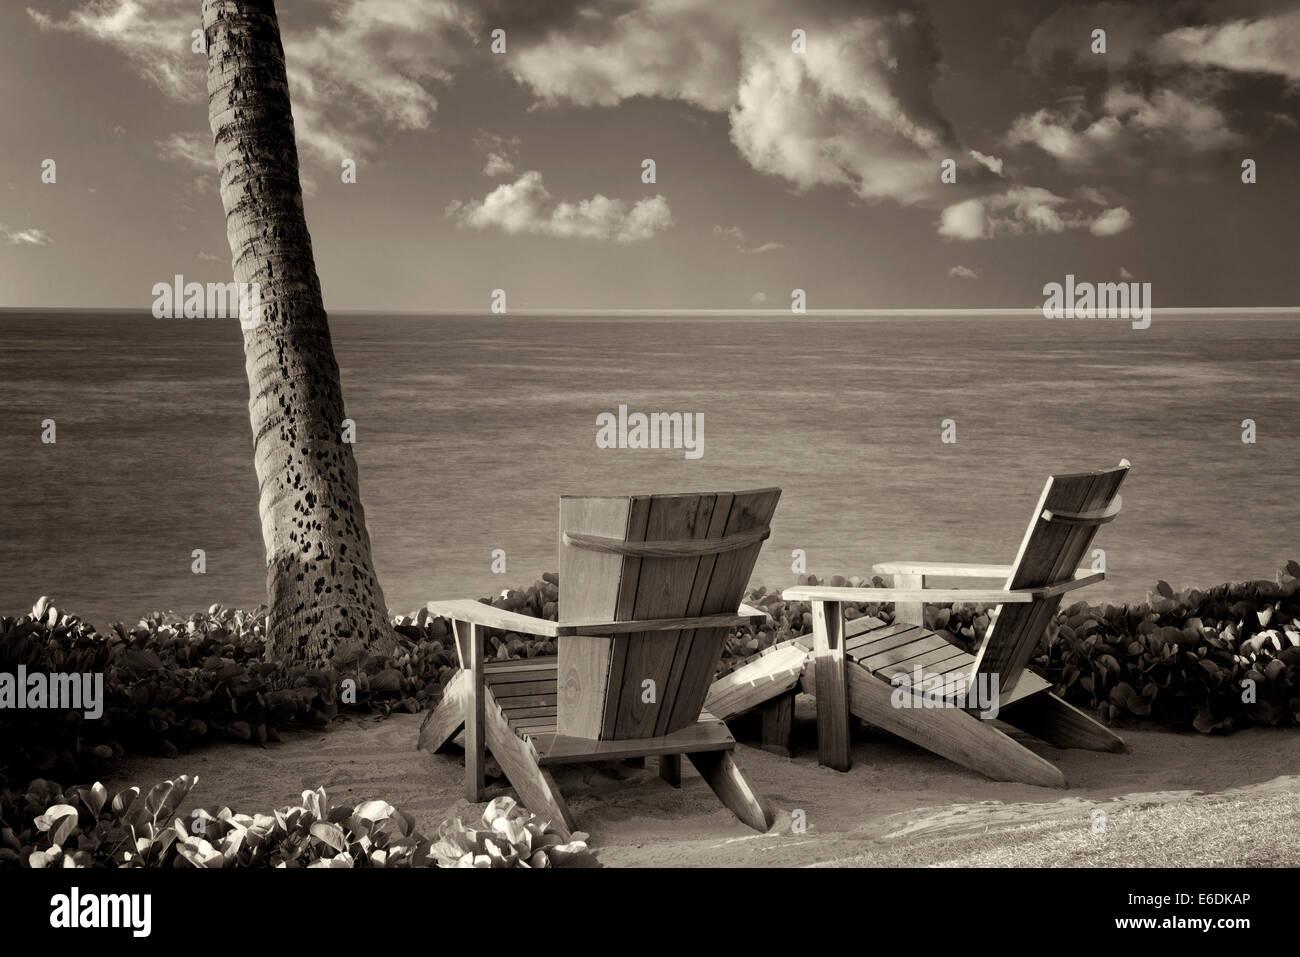 Zwei Andirondac Stühlen mit Blick auf Ozean im Four Seasons. Lanai, Hawaii. Stockbild